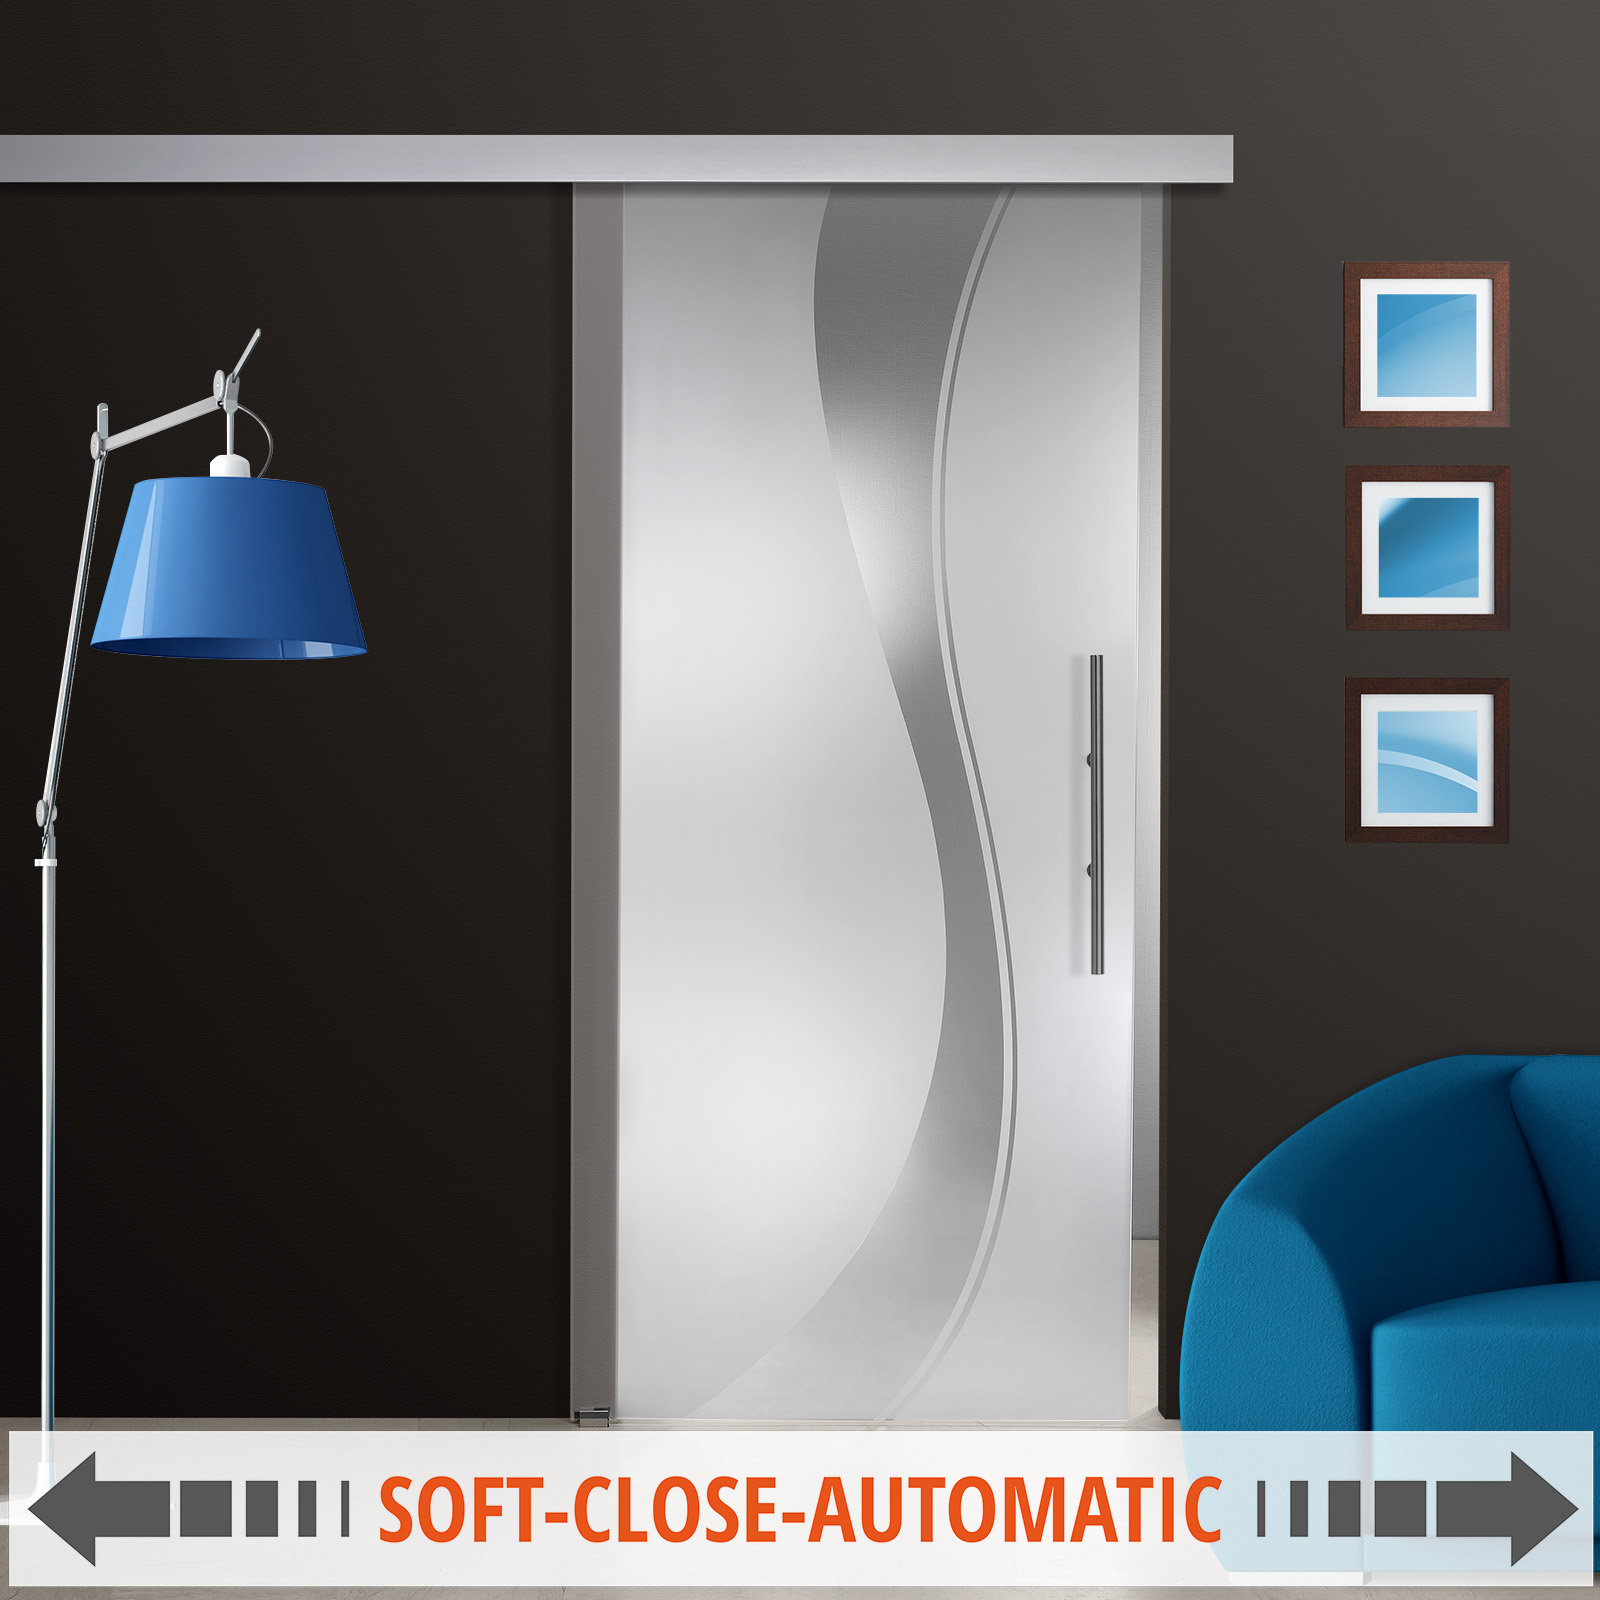 glasschiebet r st668 f klarglas dekor mit ag50 schiebesystem option soft close ebay. Black Bedroom Furniture Sets. Home Design Ideas